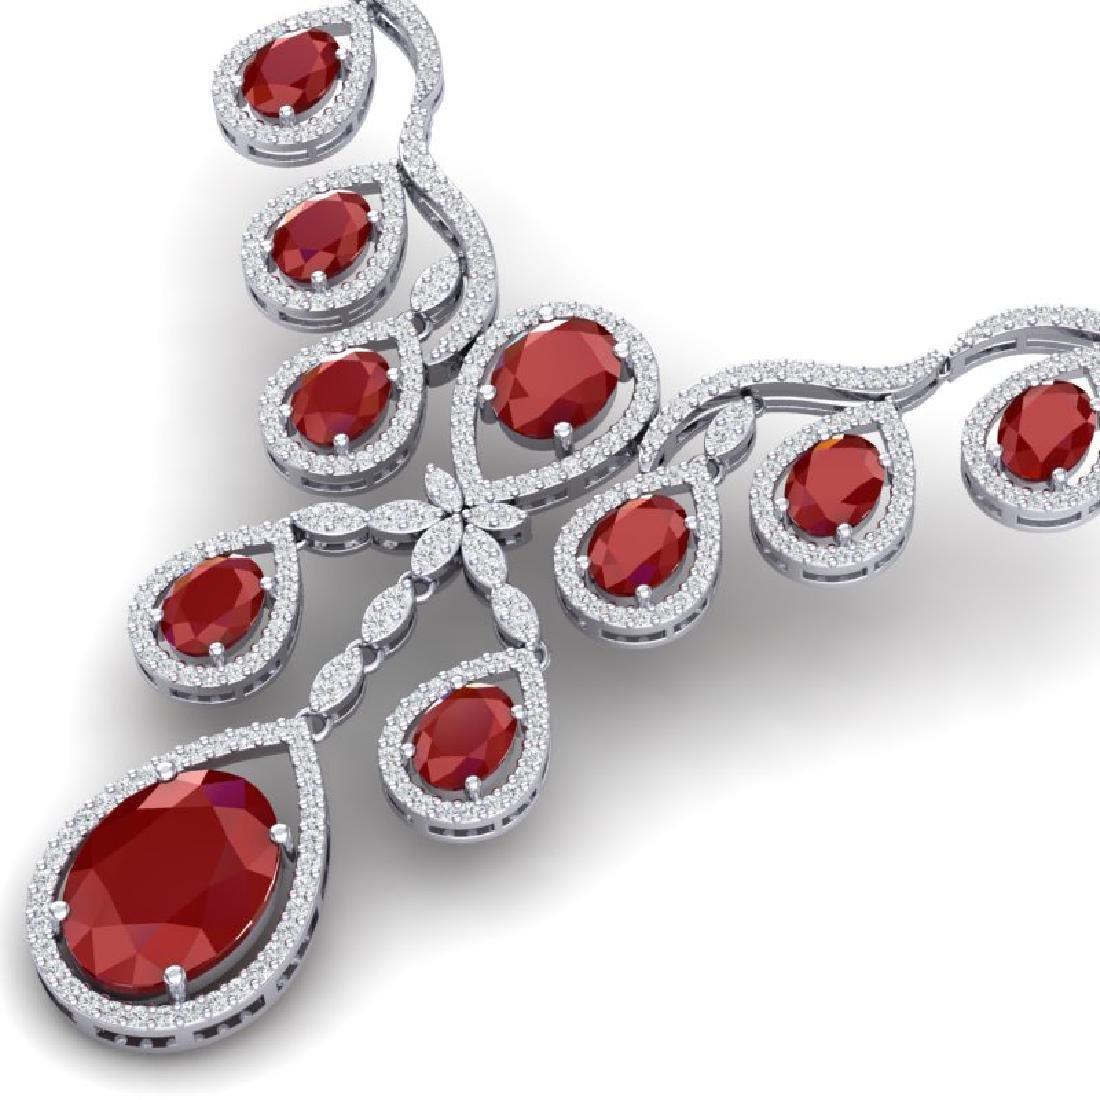 37.66 CTW Royalty Ruby & VS Diamond Necklace 18K White - 2